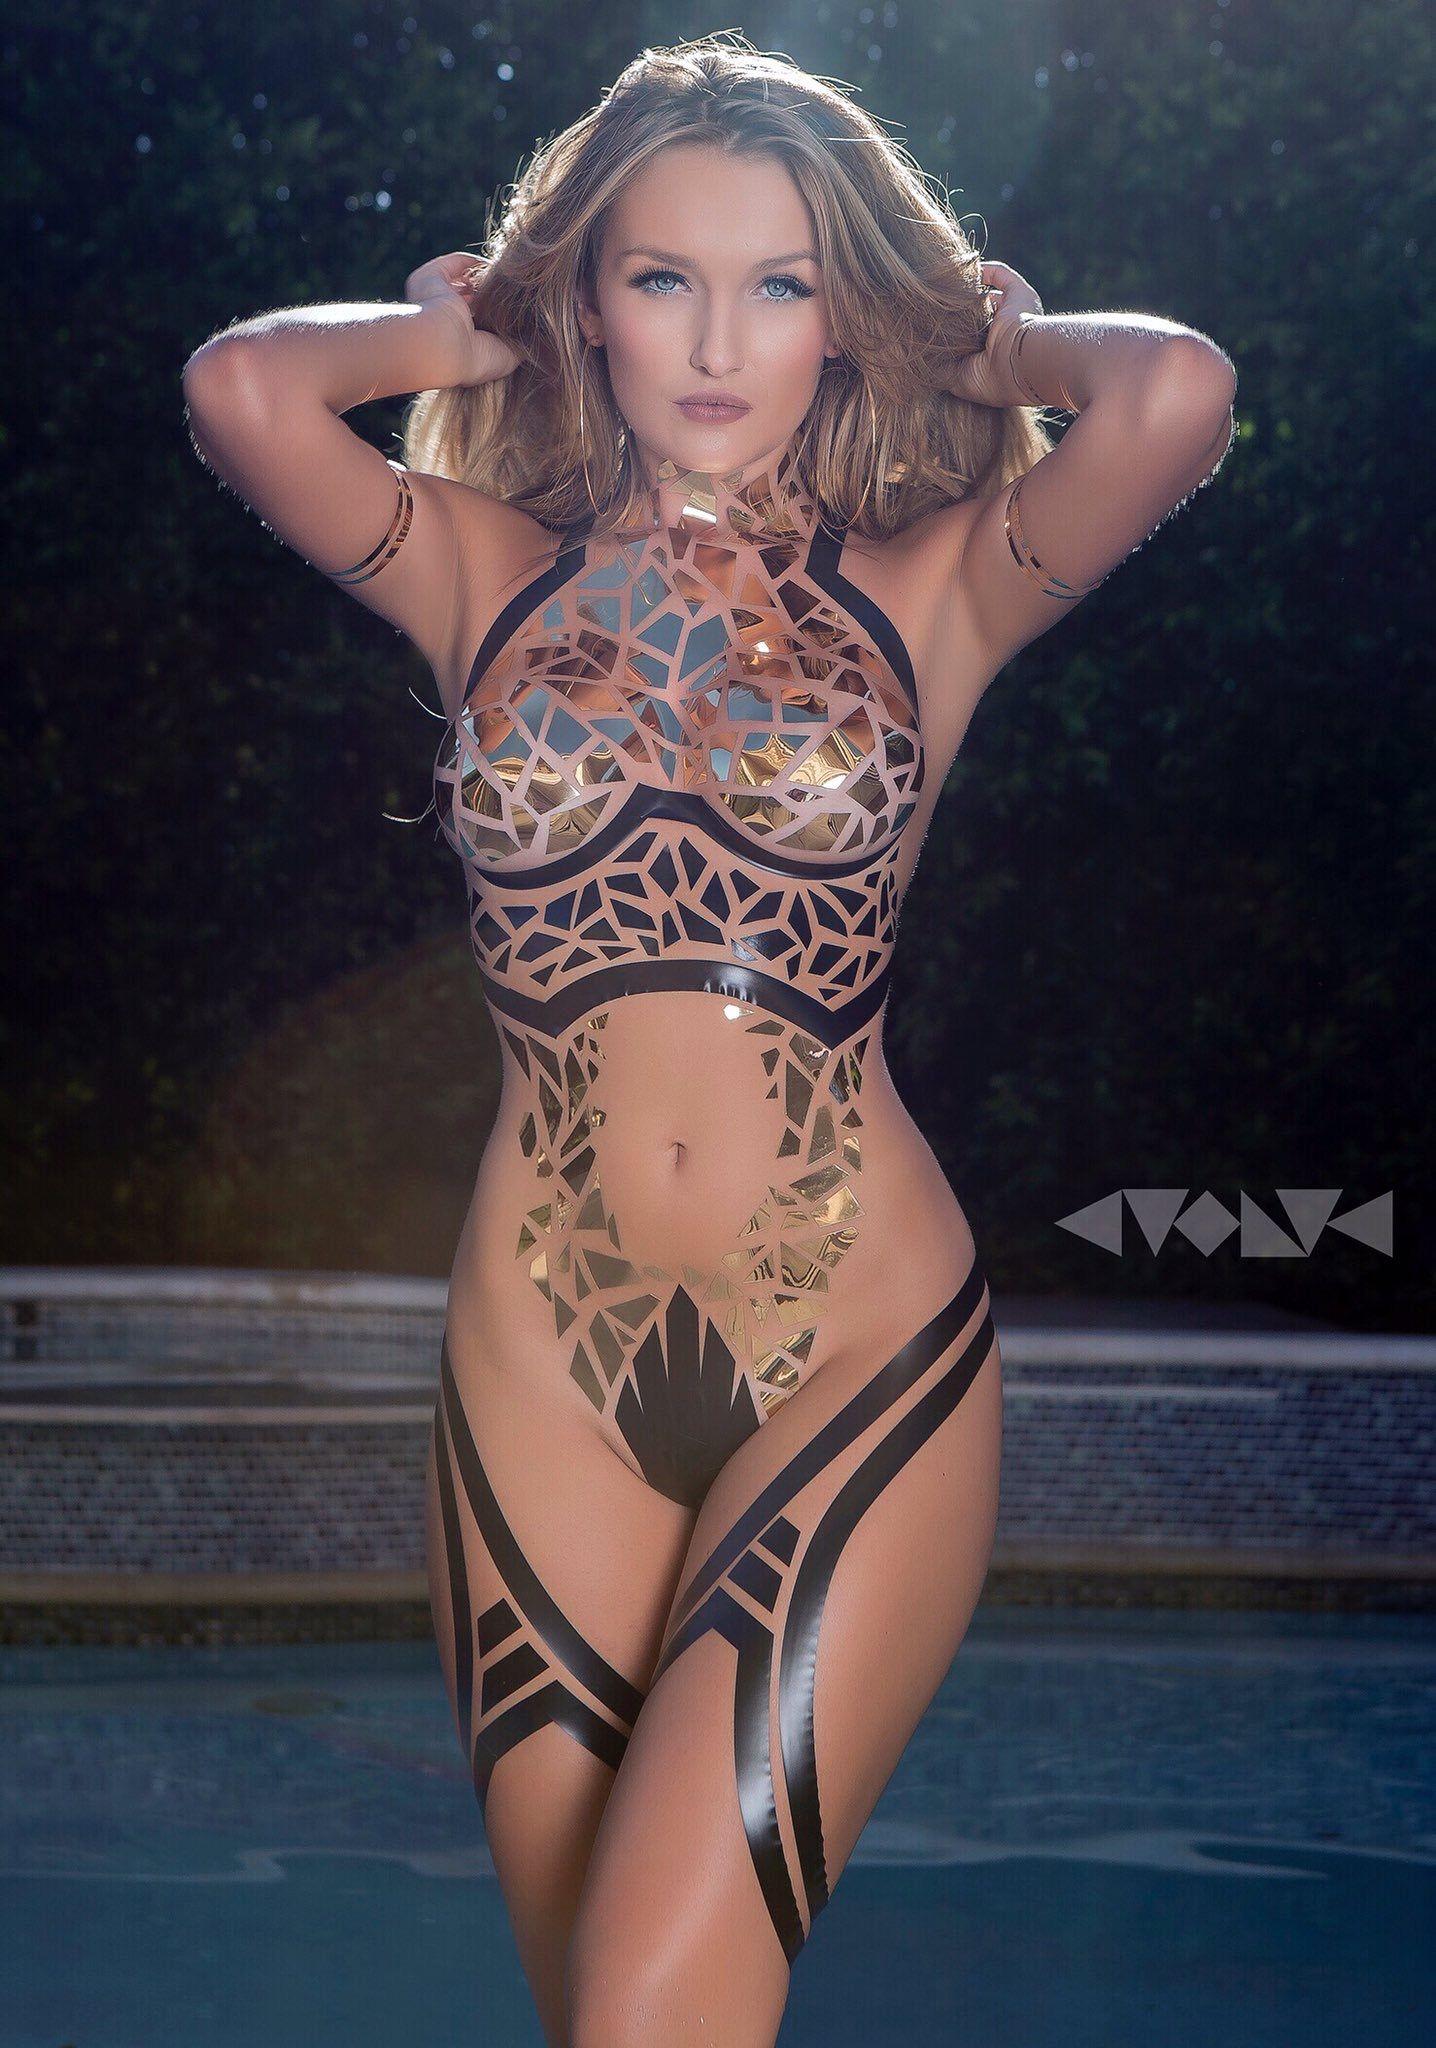 Trista Mikail Nude